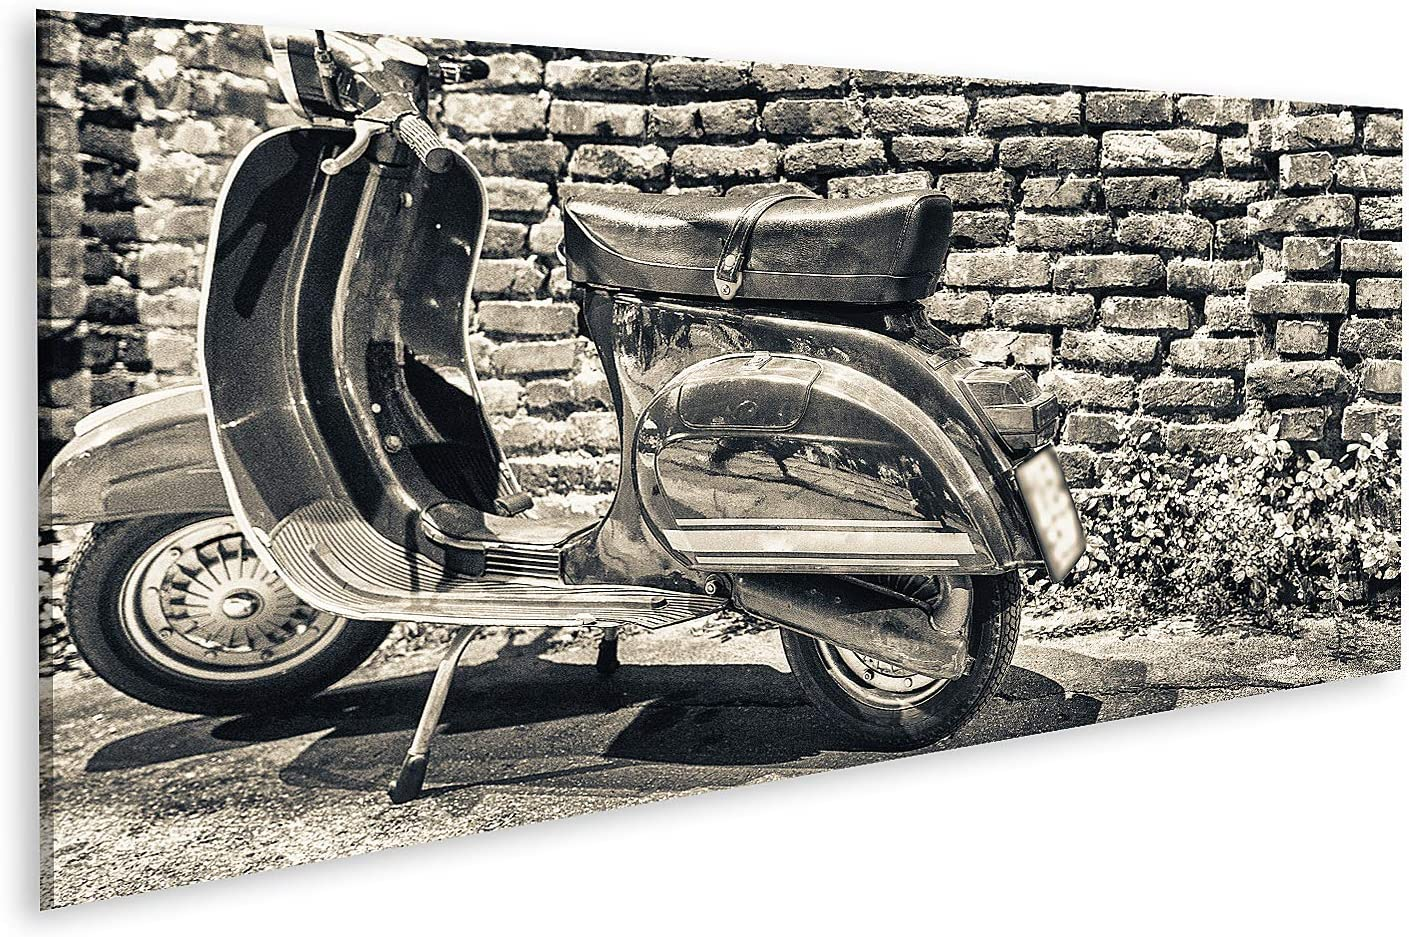 Bild auf Leinwand Milano Italy September alte Vespa geparkt entlang navig navigli Nacht italienisches Motorrad Bilder Wandbild Poster Leinwandbild